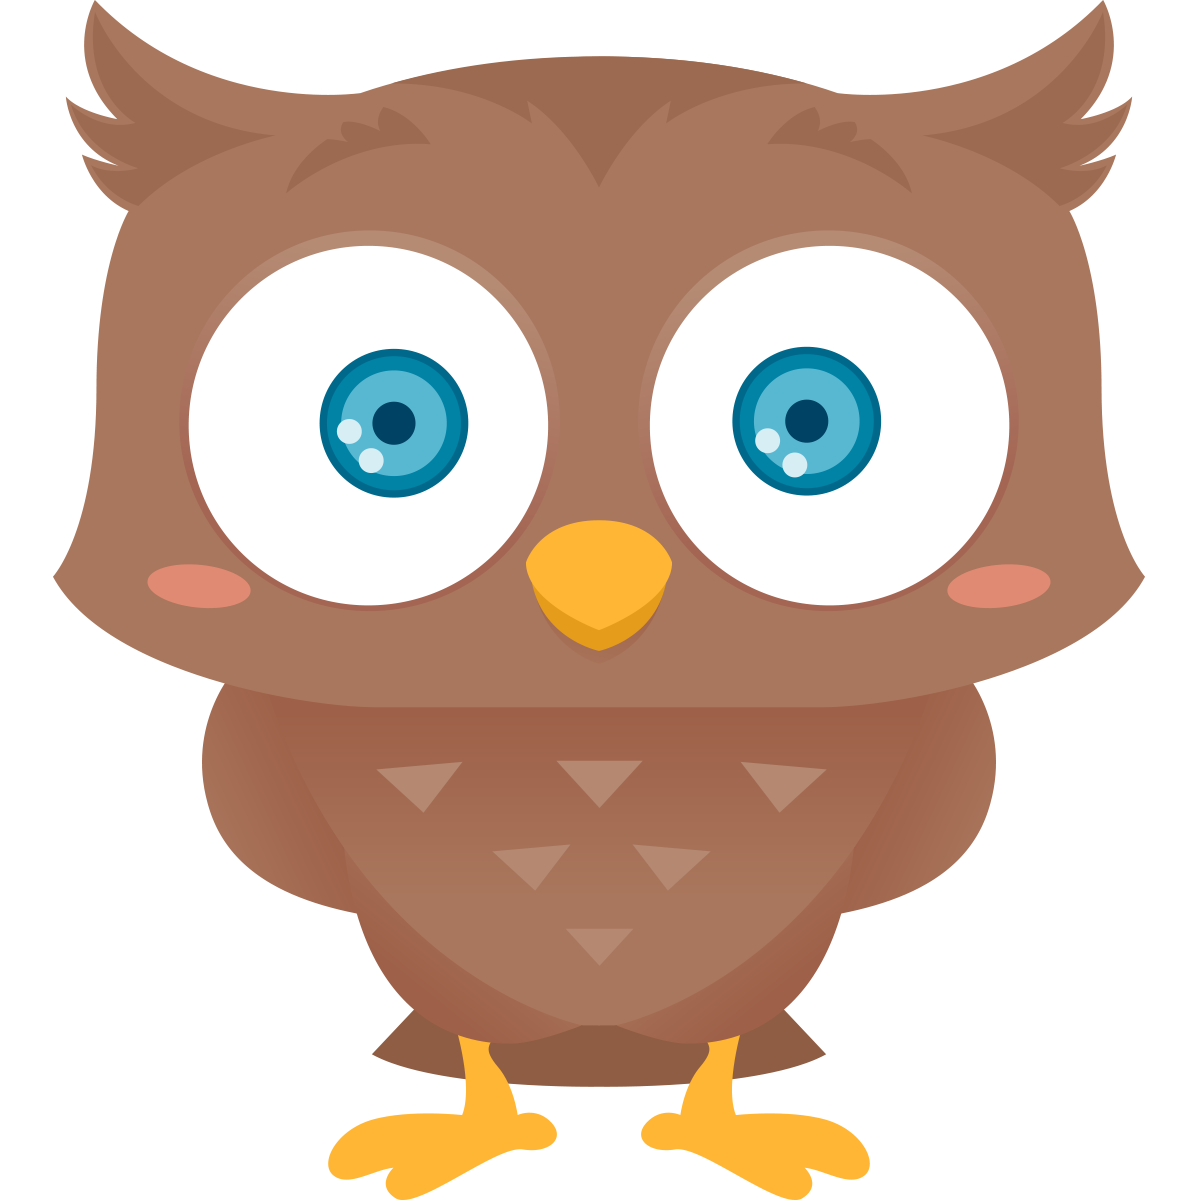 Cute owl clip art png - photo#8